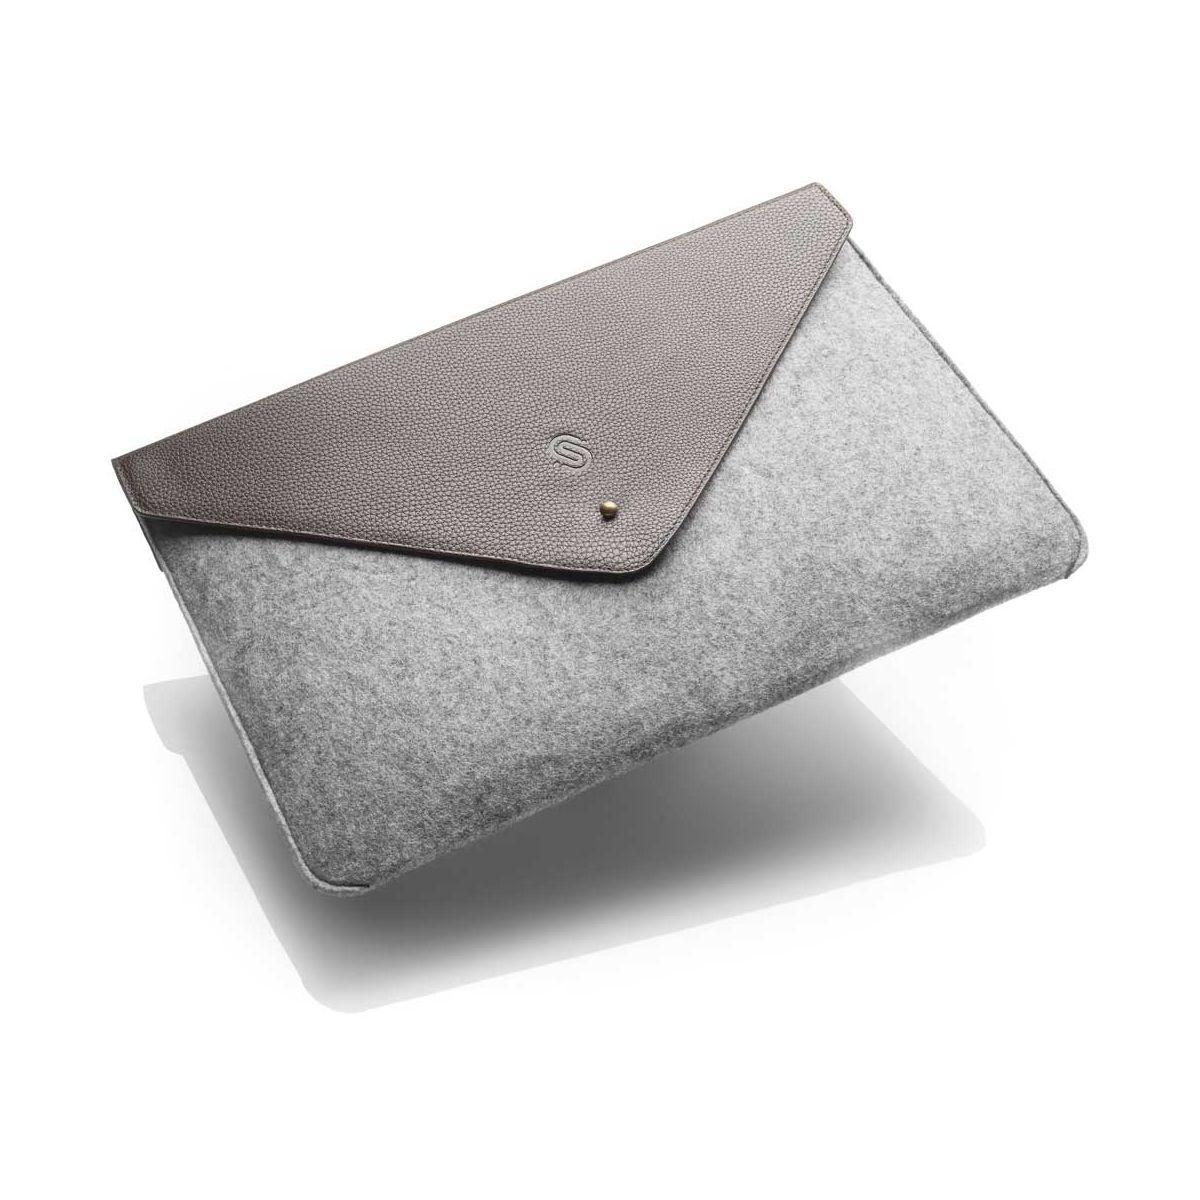 Etui tablette graphique iskn sleeve pour slate2 + (photo)